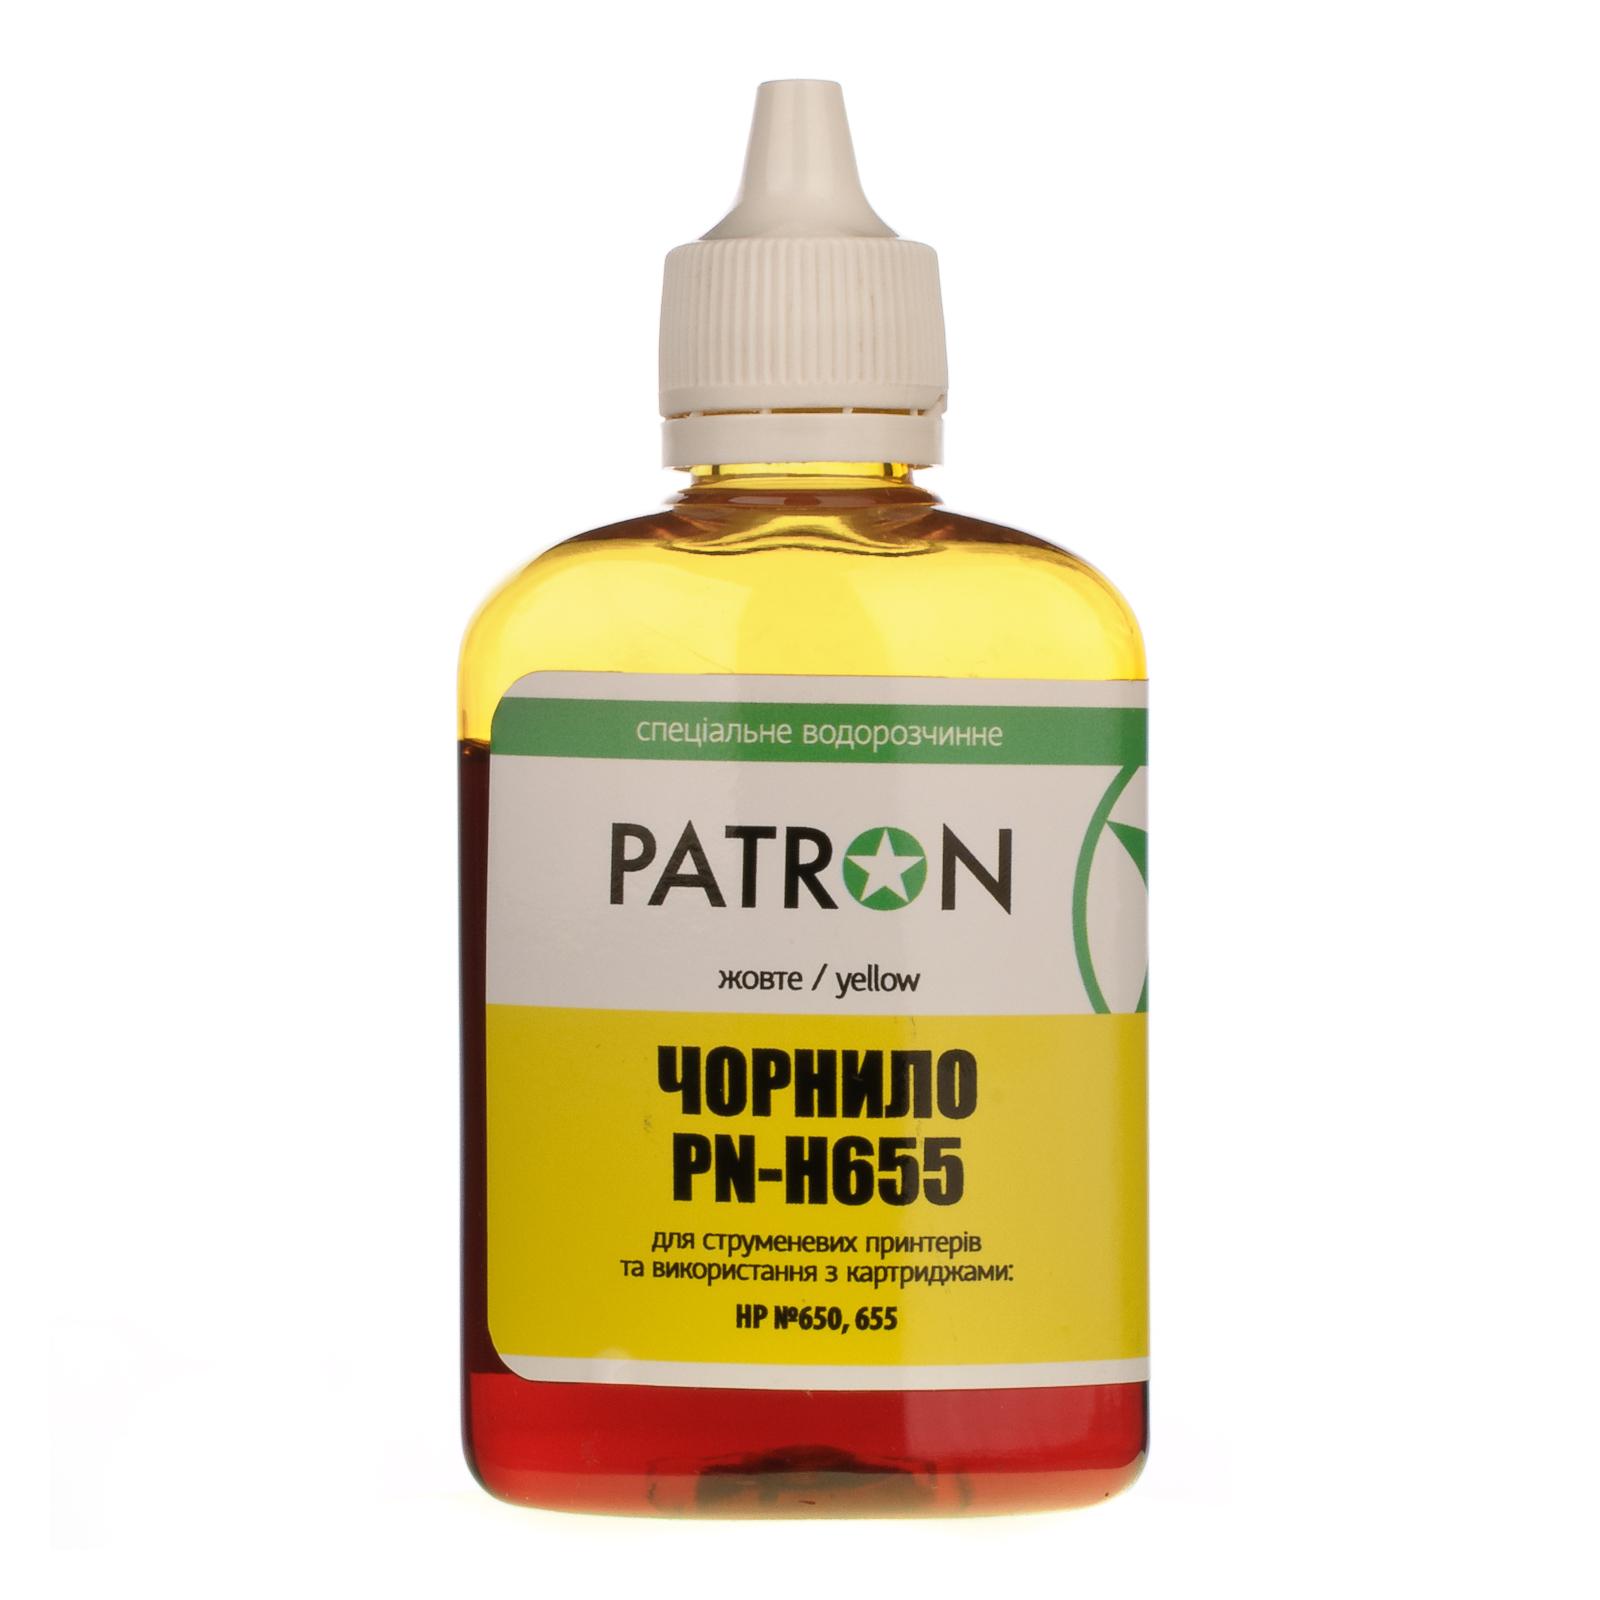 Чернила PATRON HP №650/655 90г YELLOW (I-PN-H655-090-Y)